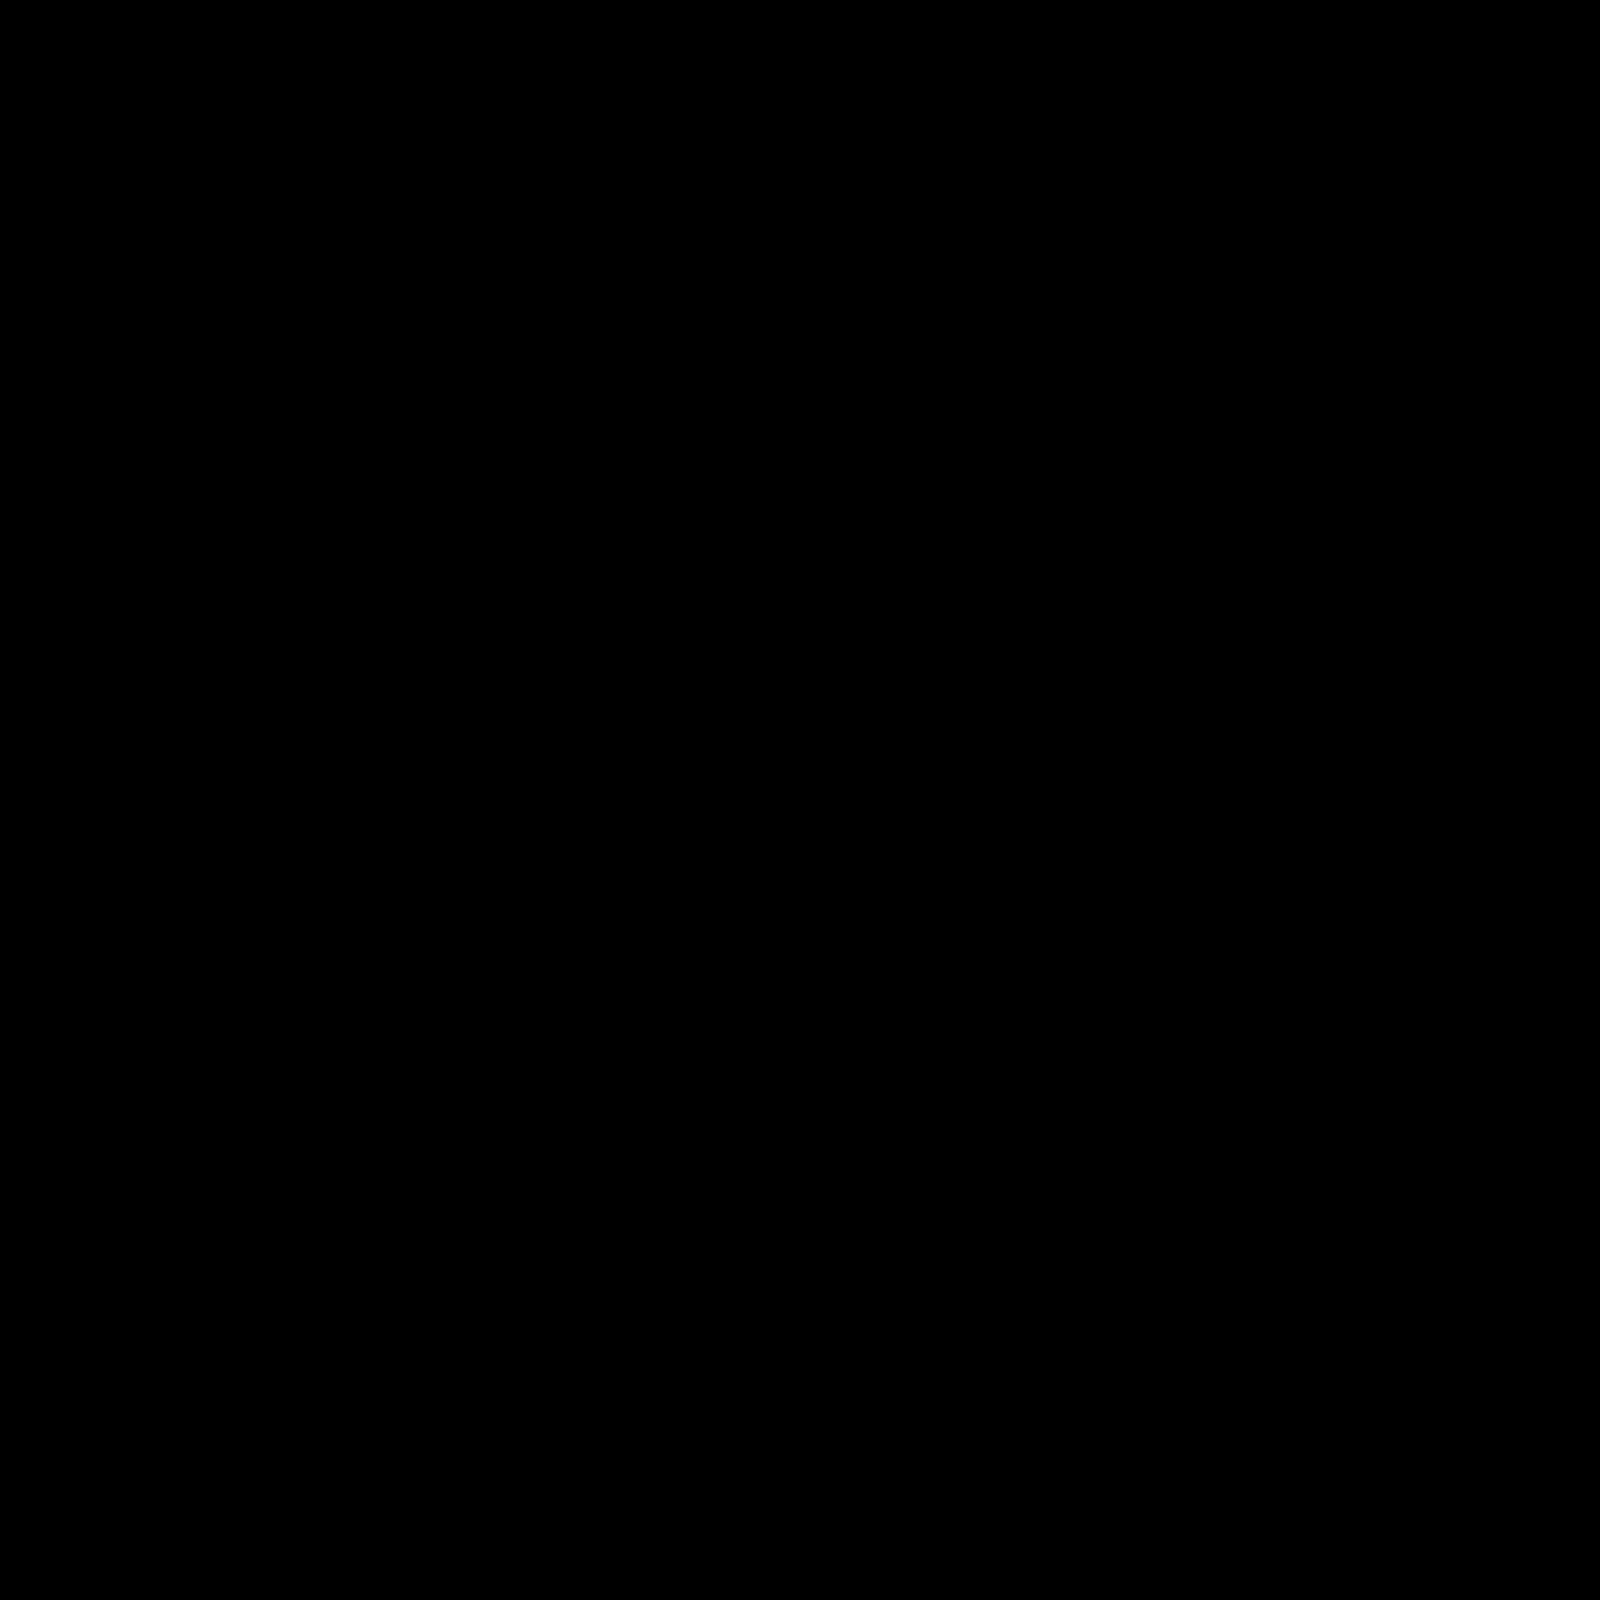 PNG Star Wars - 59896